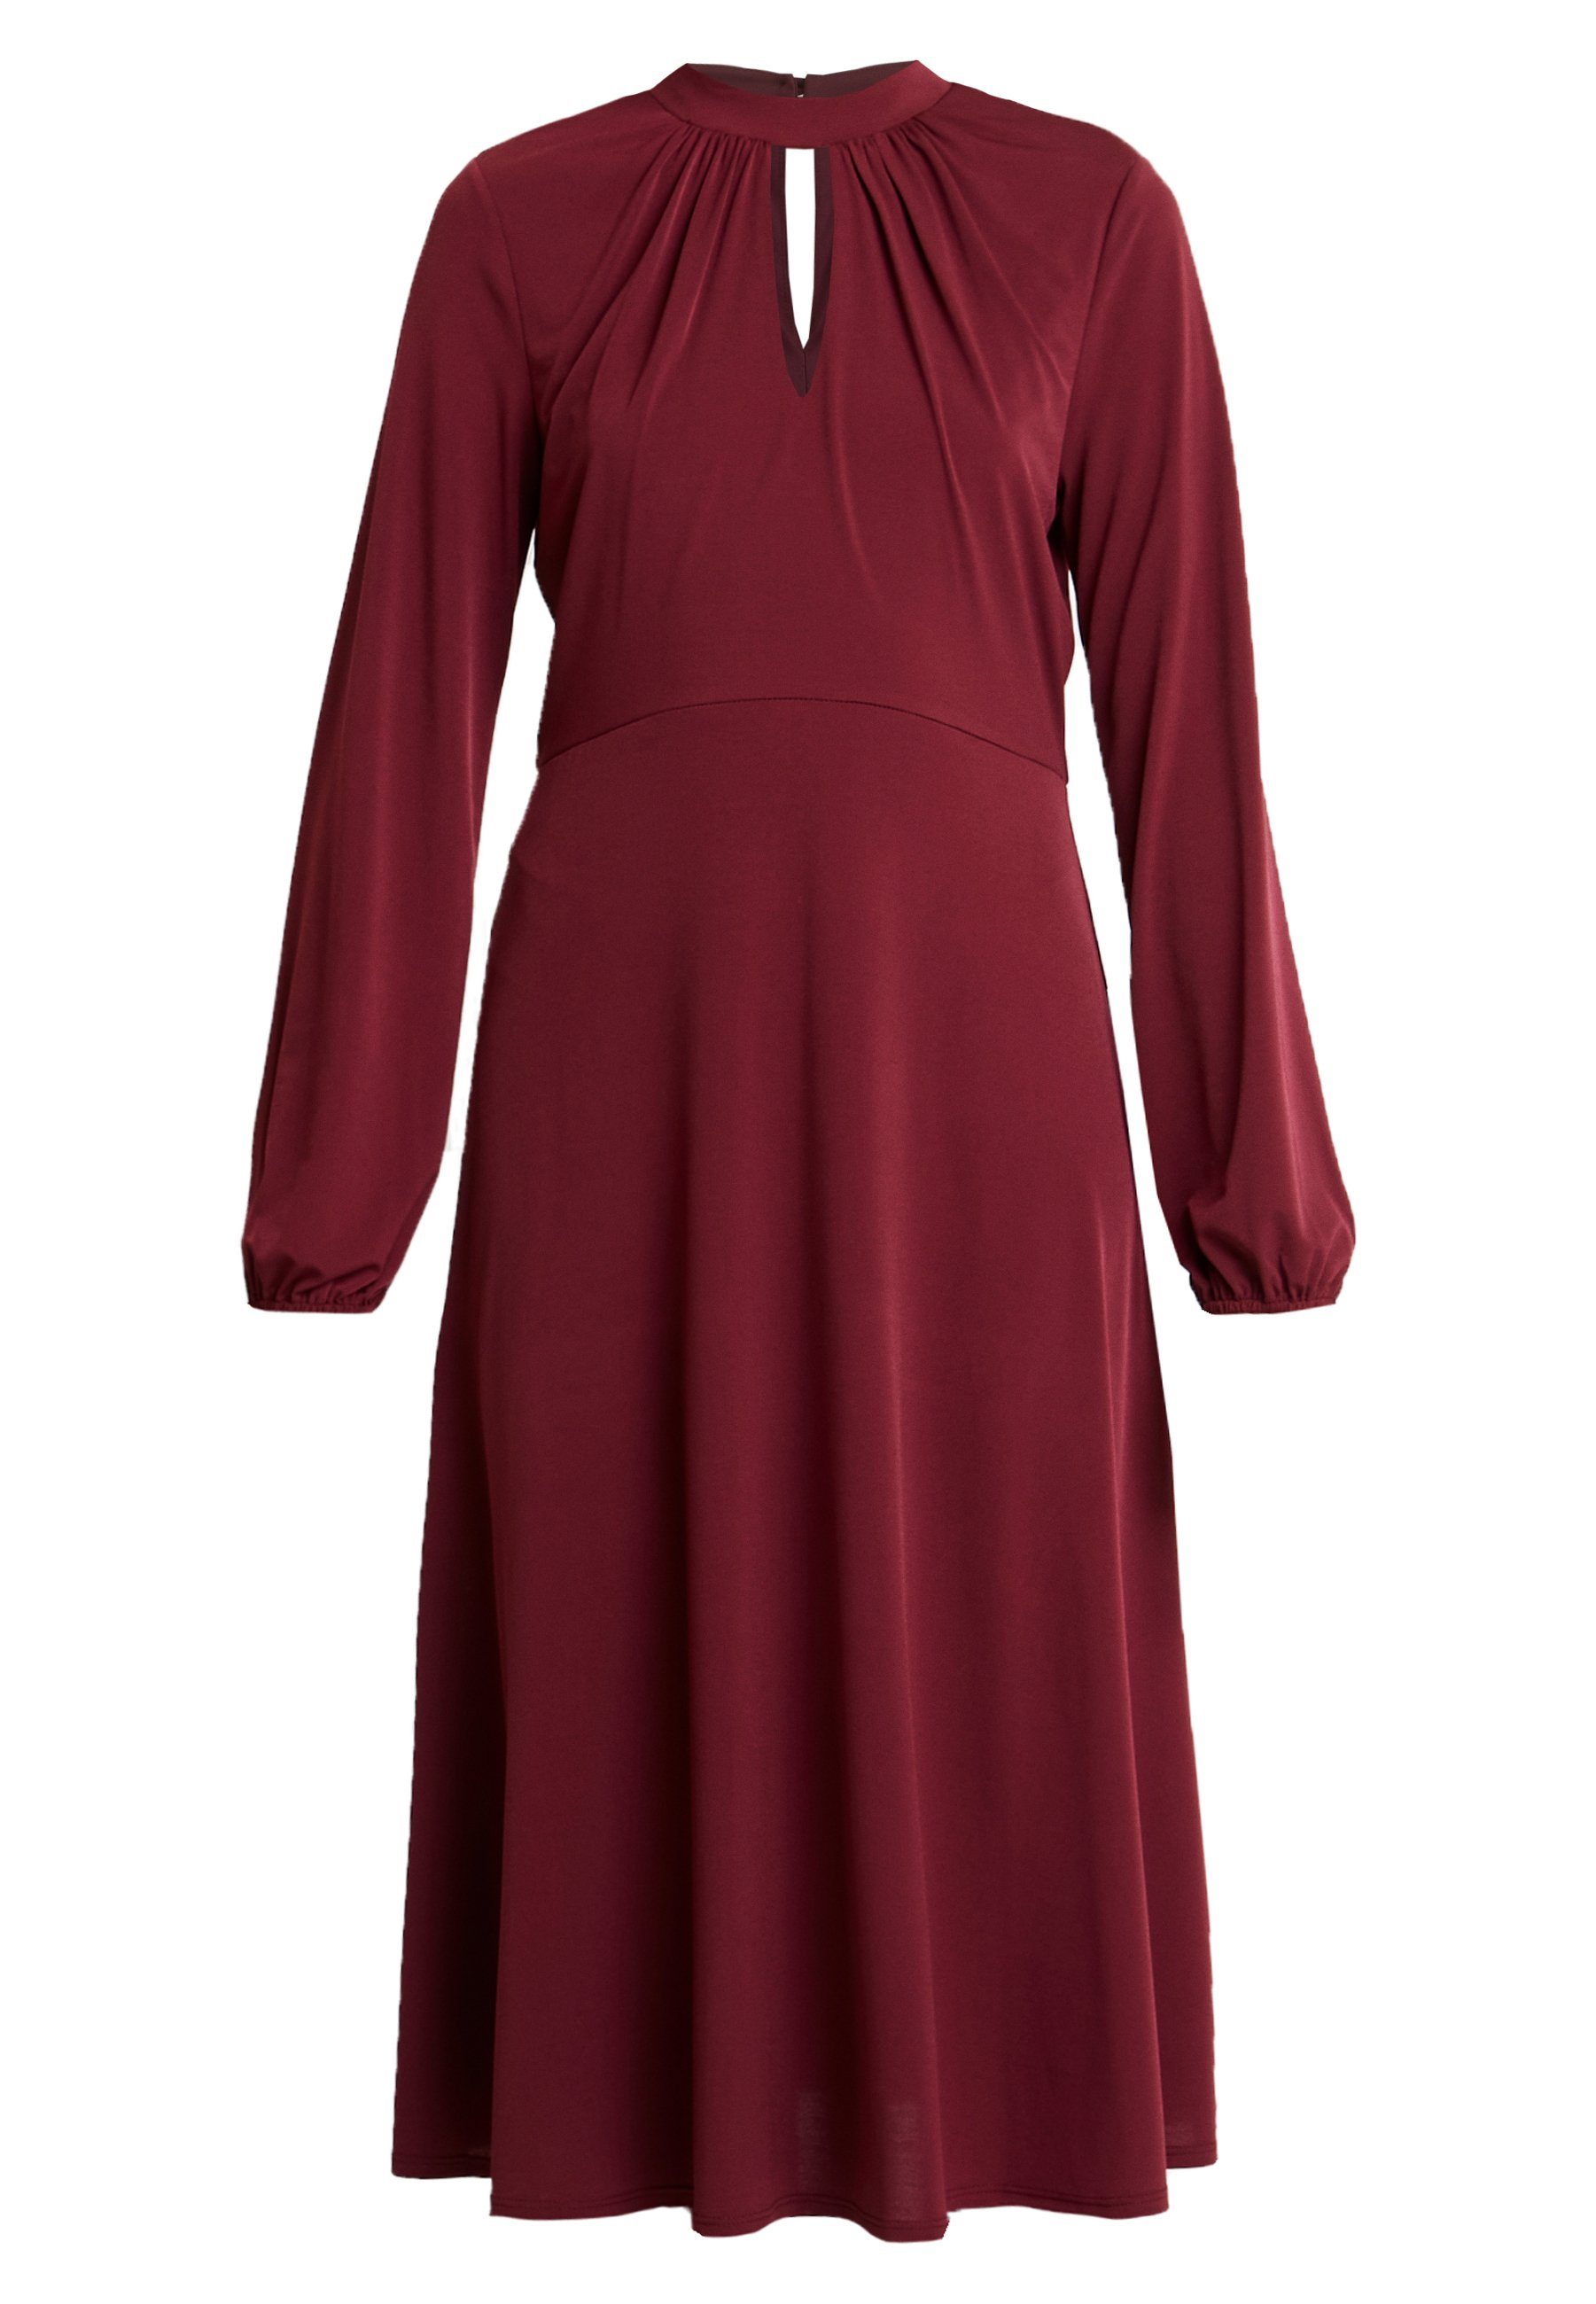 Wallis Tall High Neck Keyhole Dress - Jersey Purple